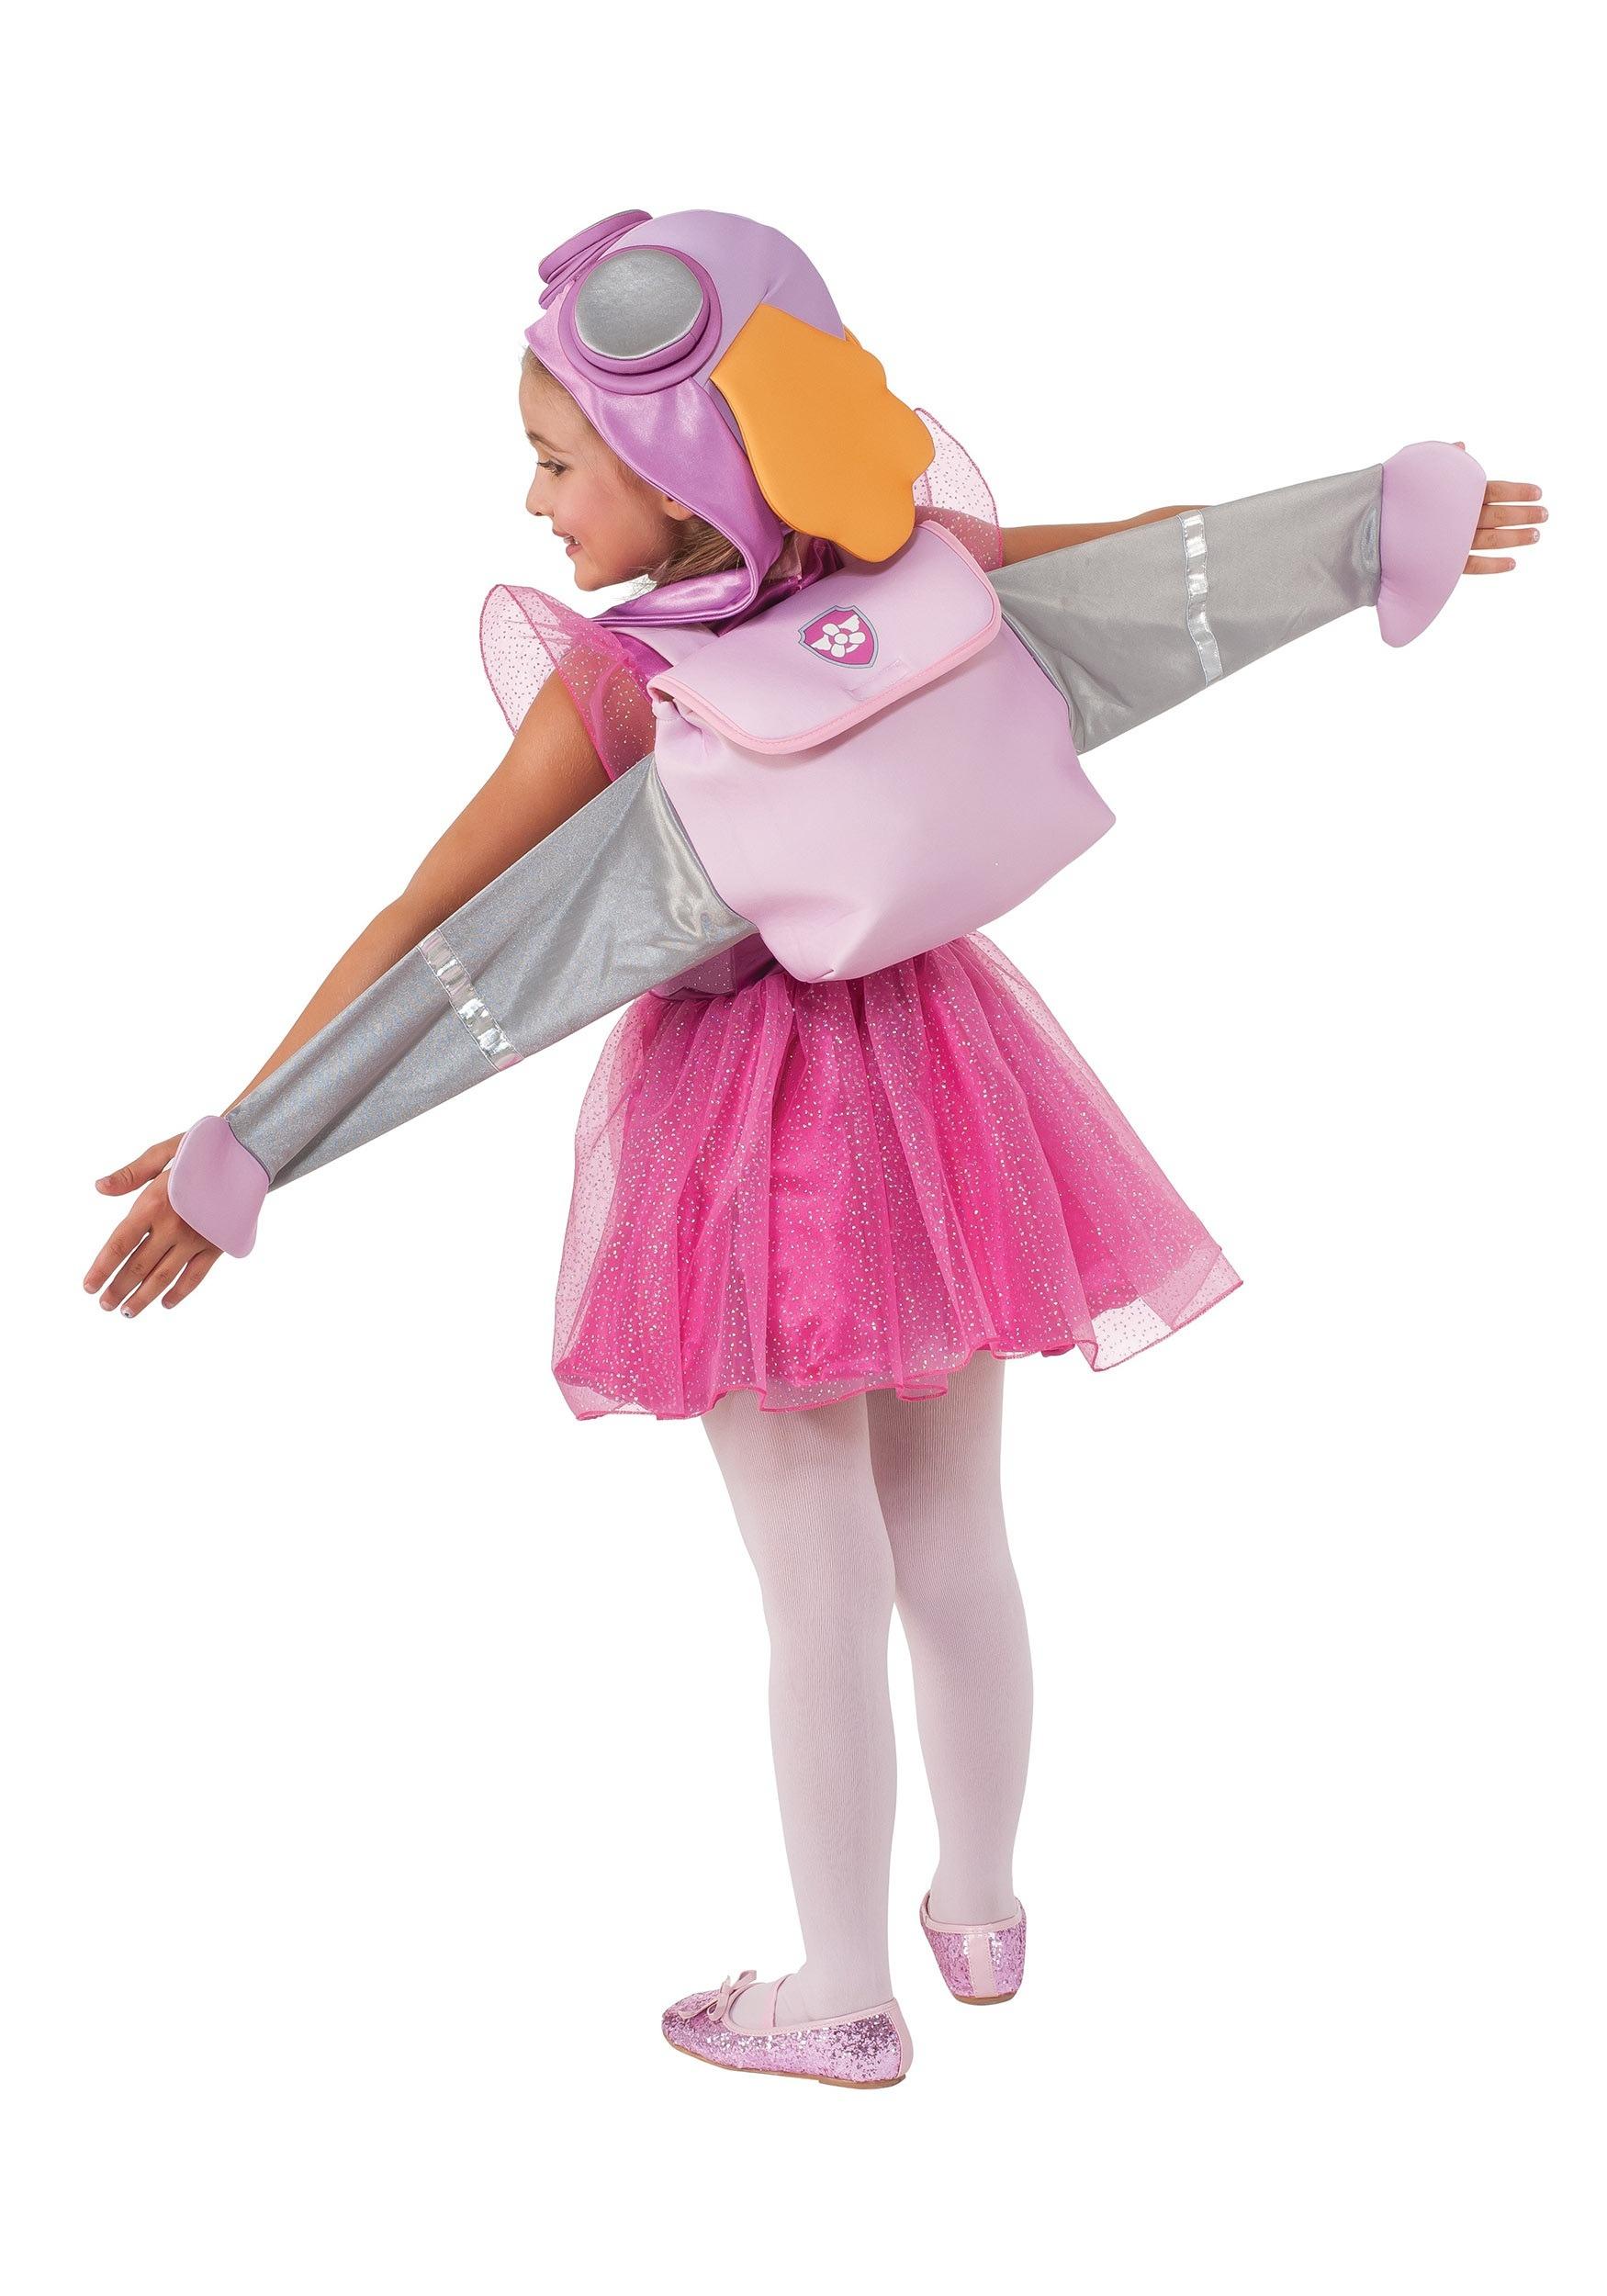 Paw patrol skye child costume - Deguisement petite fille ...